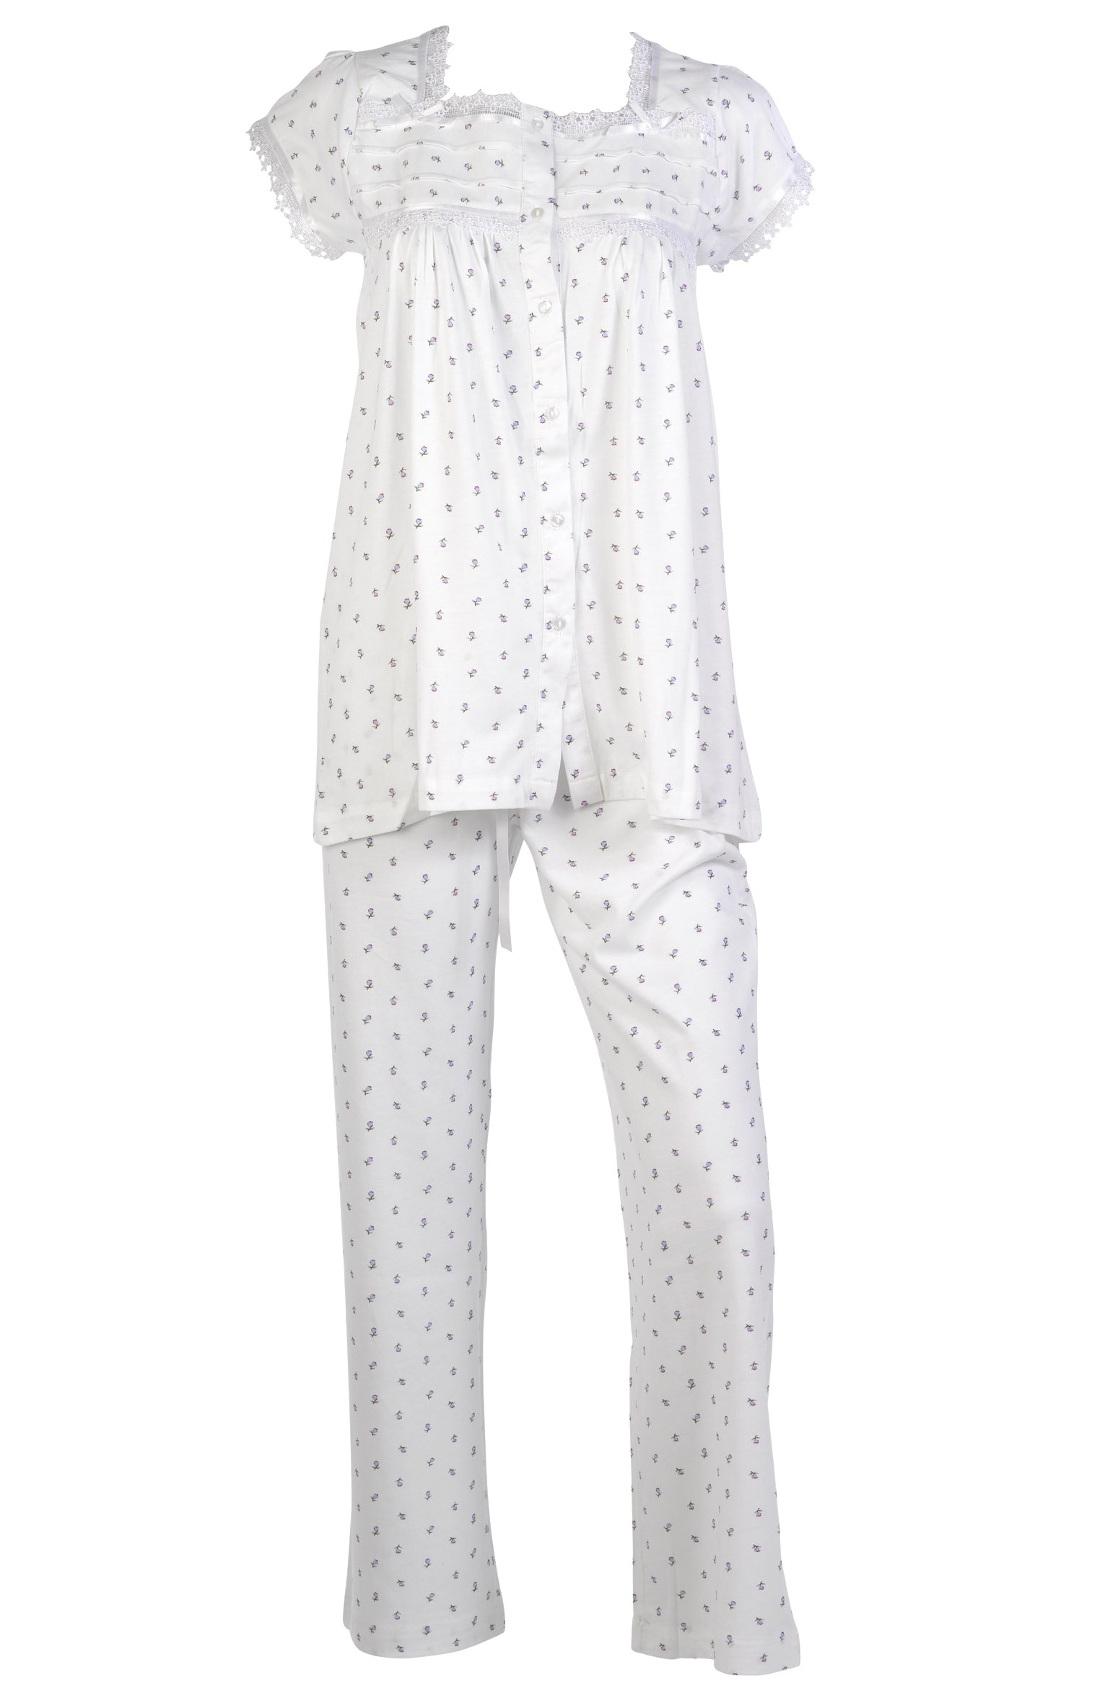 Trouser Set Ladies PJ/'s Nightwear Womens Cotton Lace Short Sleeve Pyjama Top